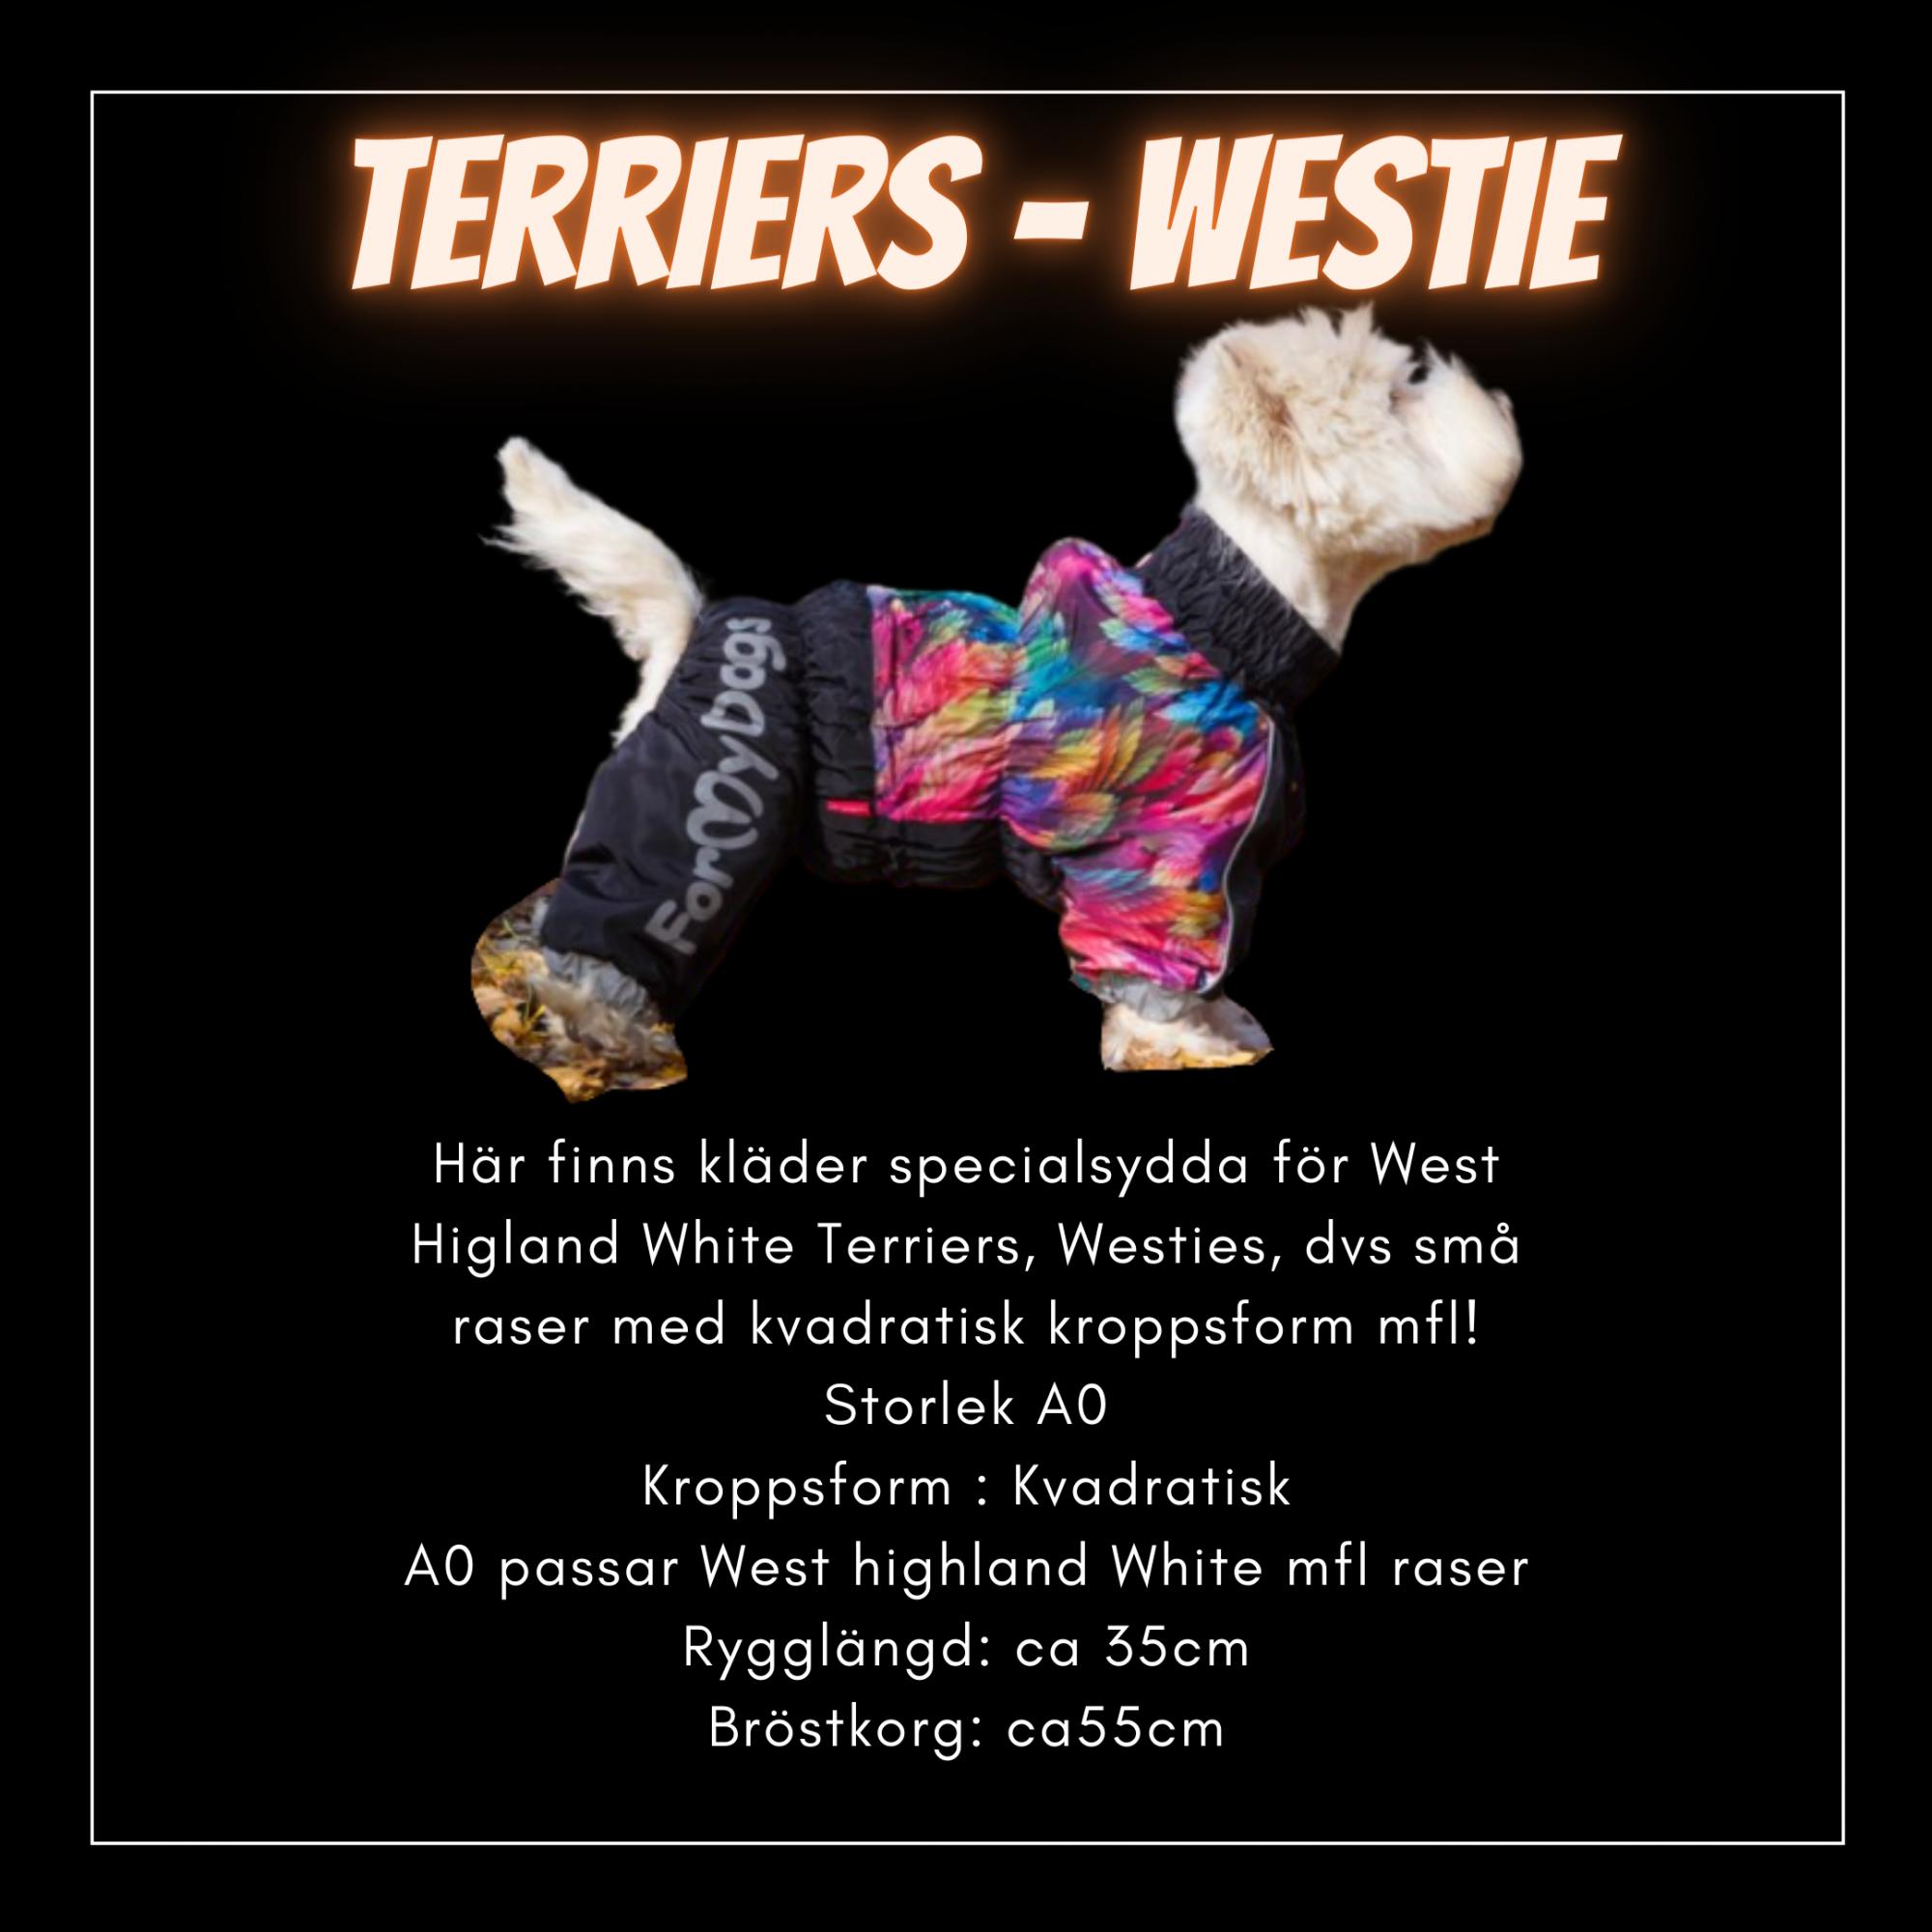 Terriers - Westie - Passion For Pet Fashion